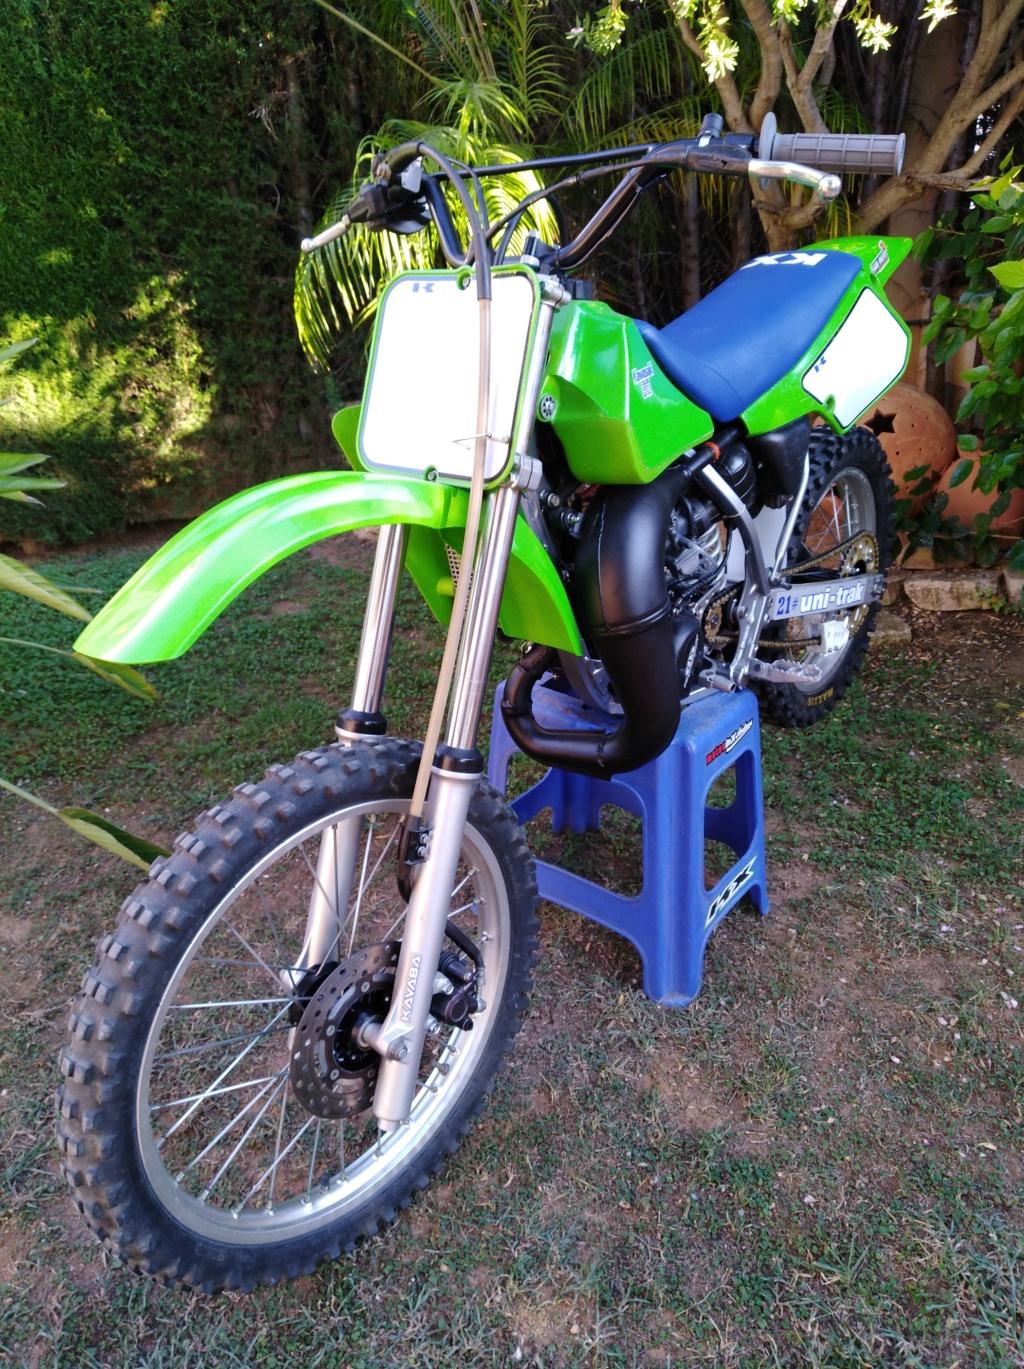 Kawasaki KX 80 1987 > Restauracion - Página 2 Img_2048